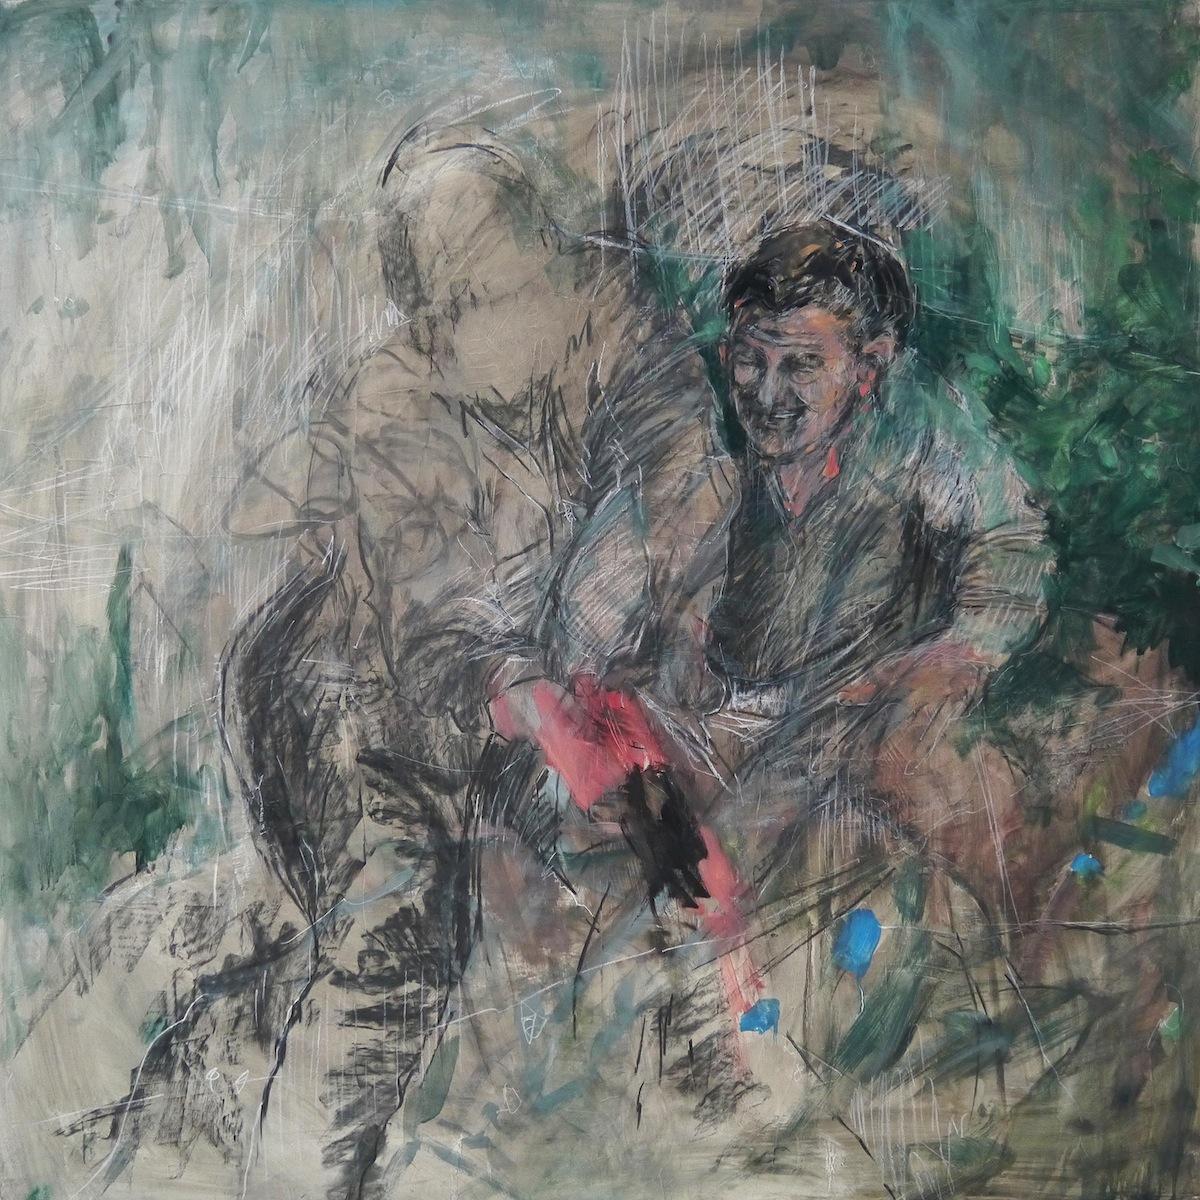 J.M. Culver Painting